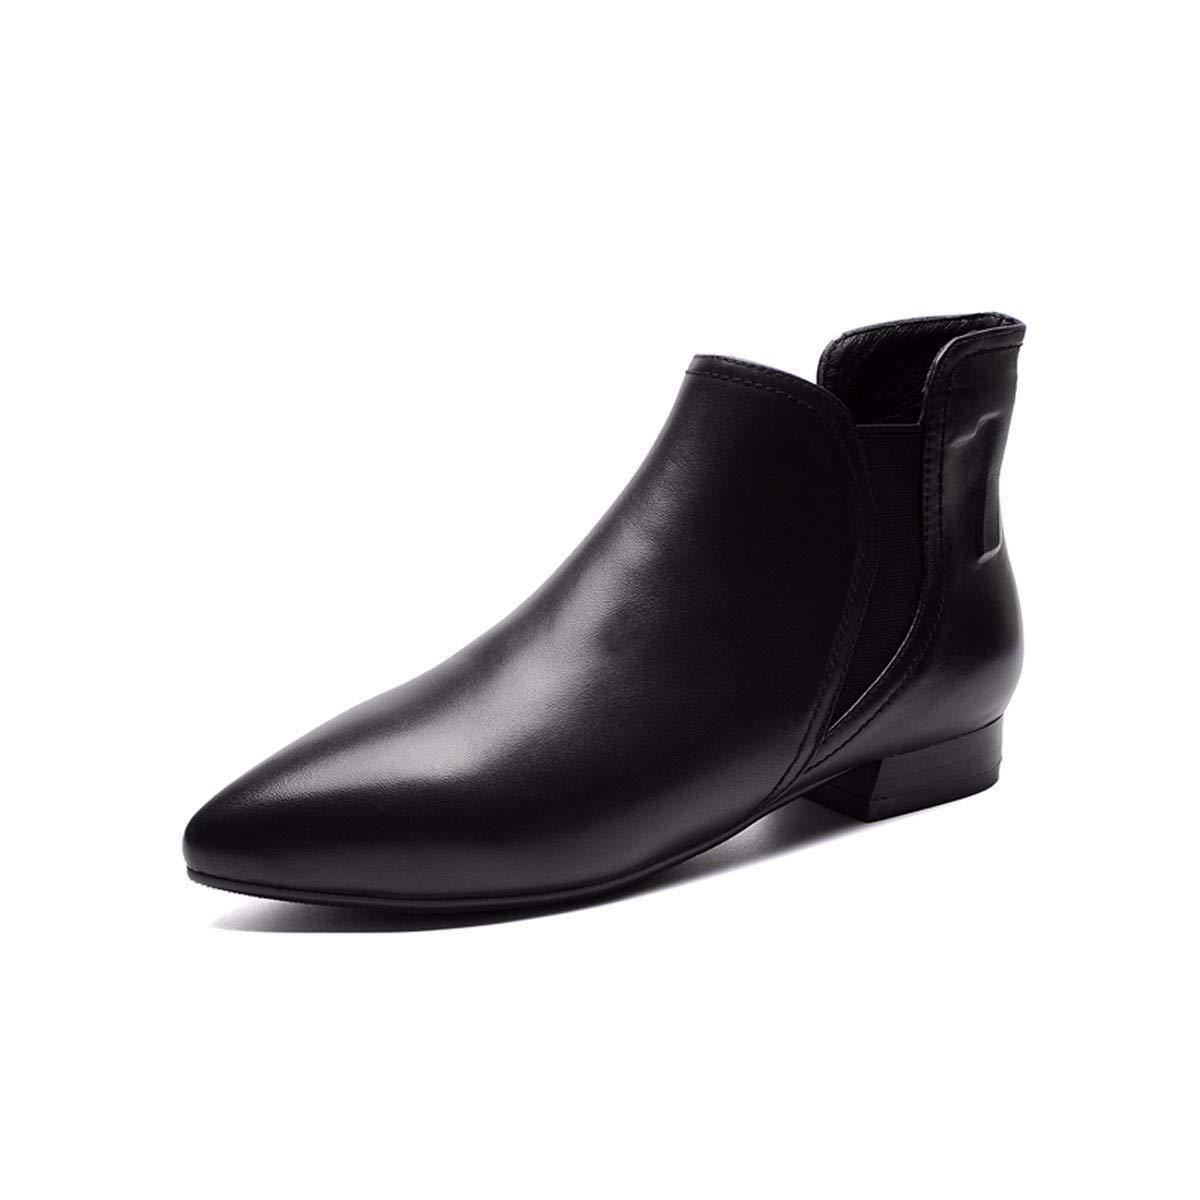 HBDLH Damenschuhe Flache Stiefeletten, Damenschuhe, Eng Mit Flachen Boden, 2 cm, Kurze Stiefel, Frauen - Stiefel, Ma Dingxue